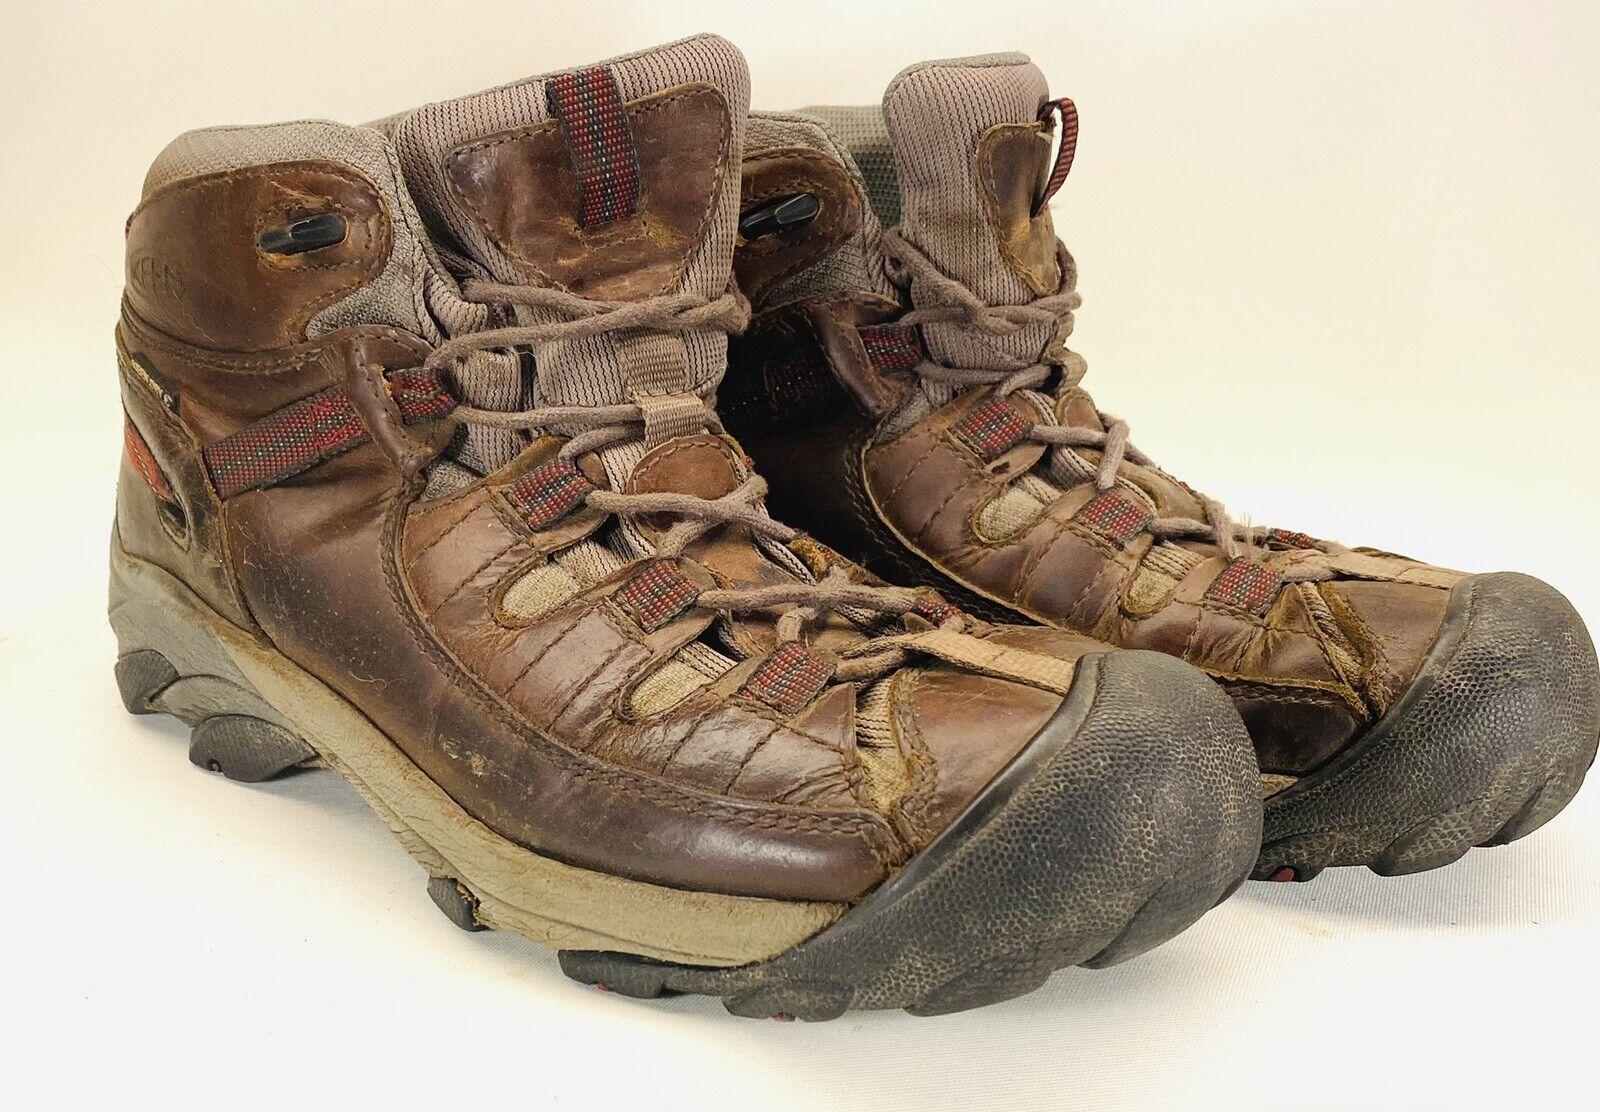 KEEN Mens Targhee Ii Raven/Tortoise Shell Hiking Boots Size 7.5 (1254181)